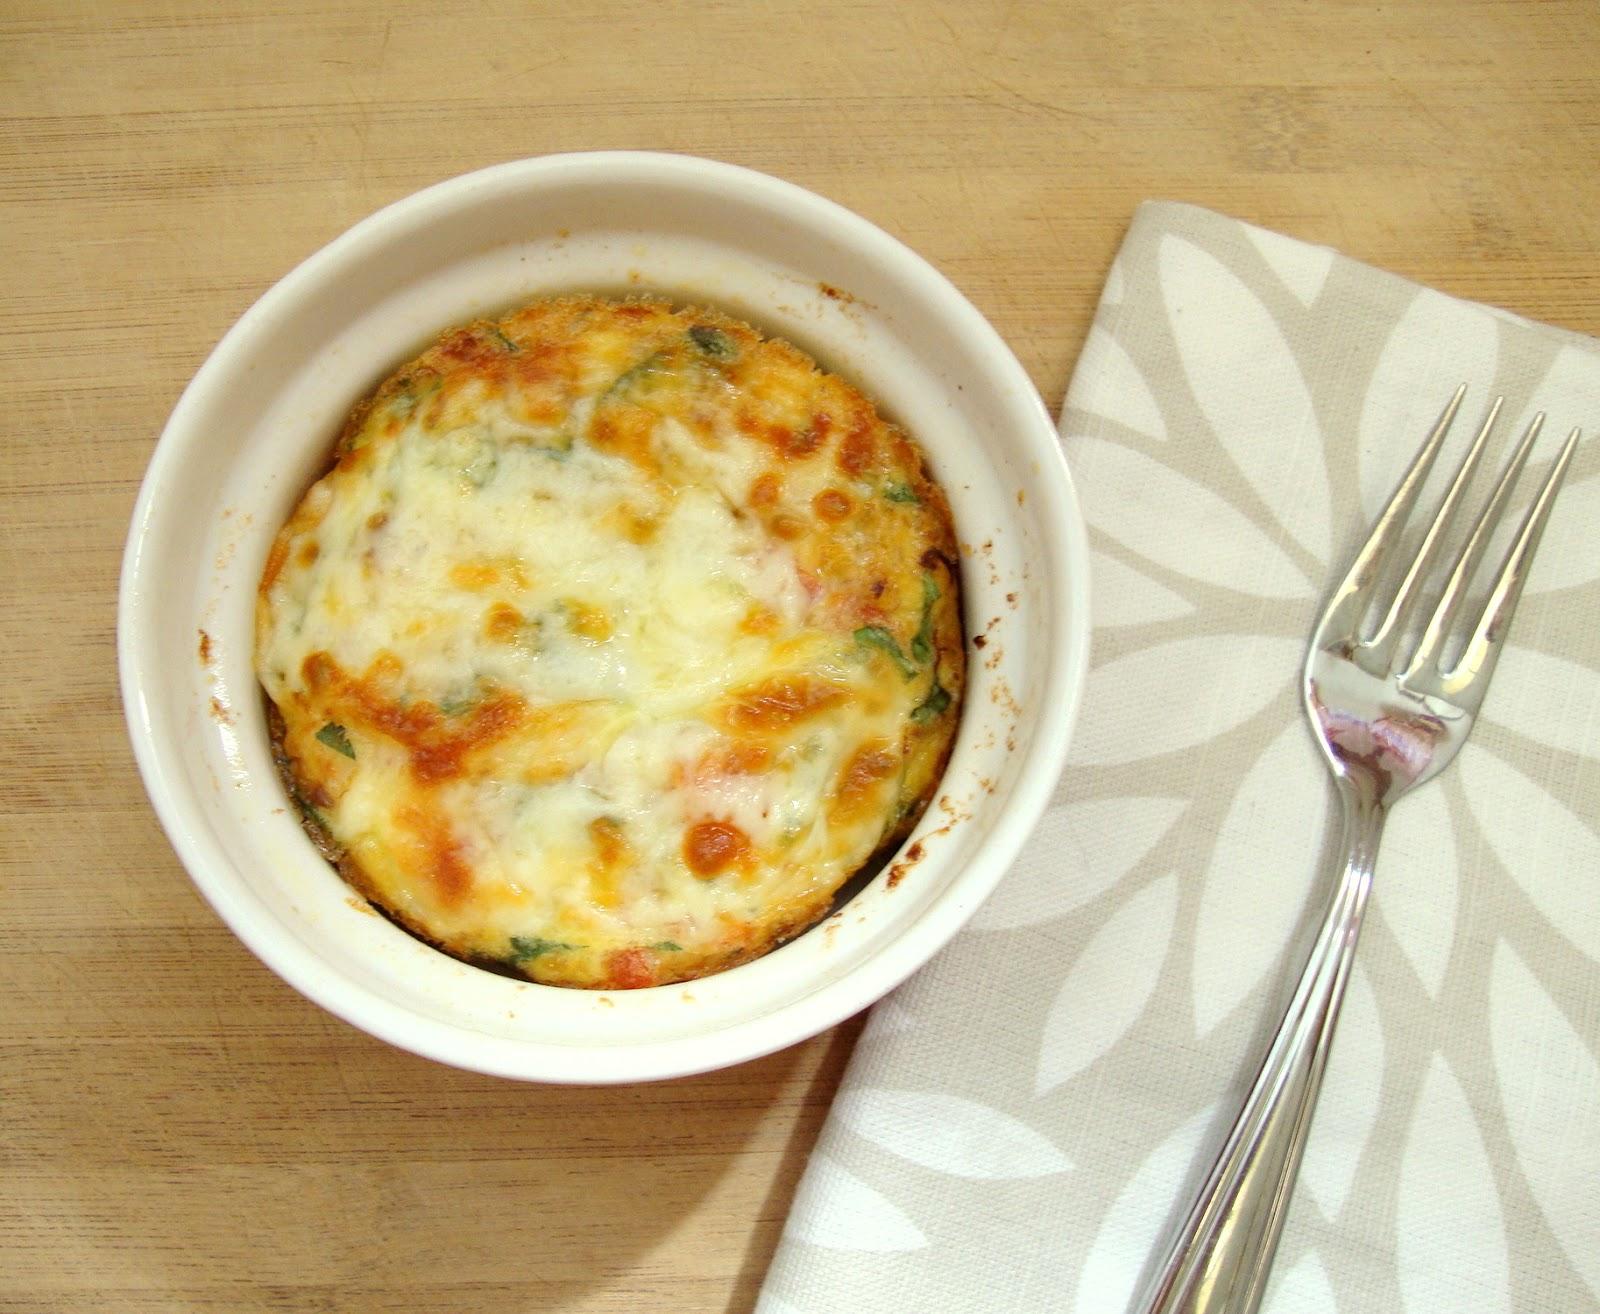 Chelsea's Culinary Indulgence: Italian Baked Eggs